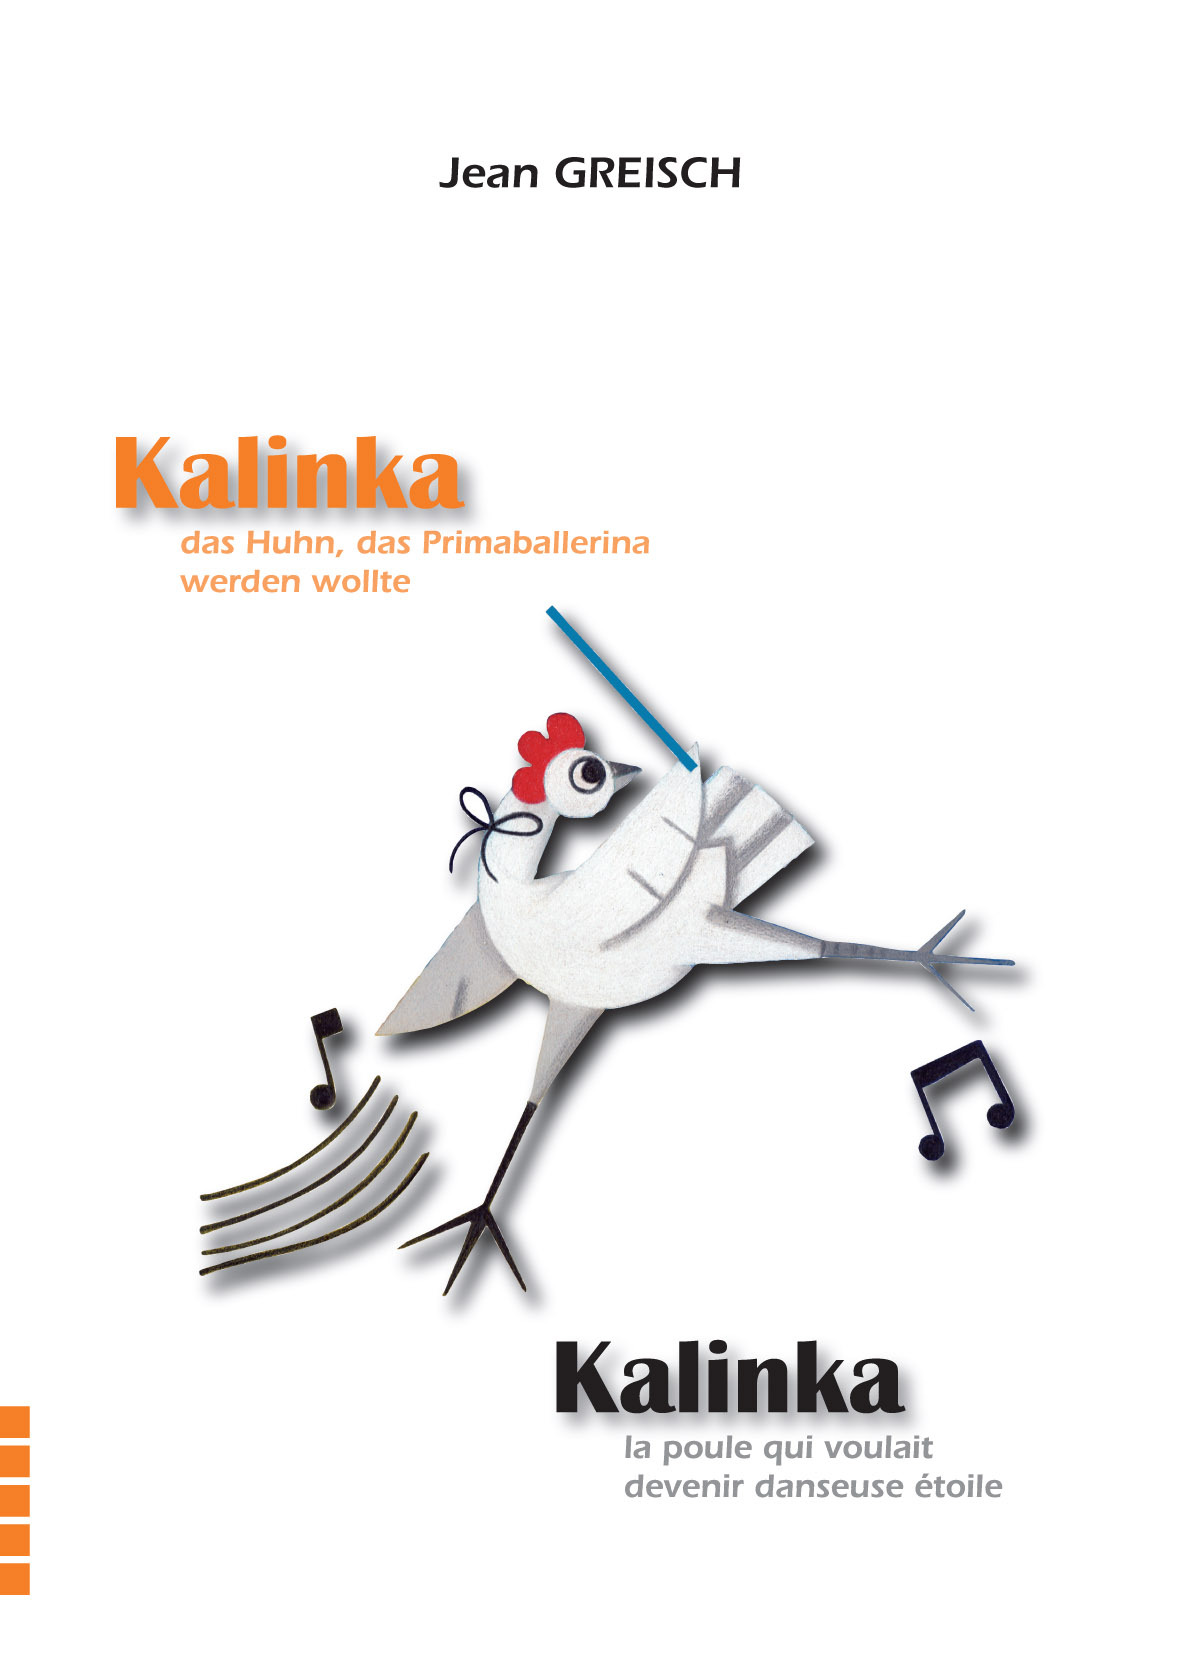 KALINKA, LA POULE QUI VOULAIT DEVENIR DANSEUSE-ETOILE / KALINKA, DAS HUHN, DAS PRIMABALLERINA WERDEN